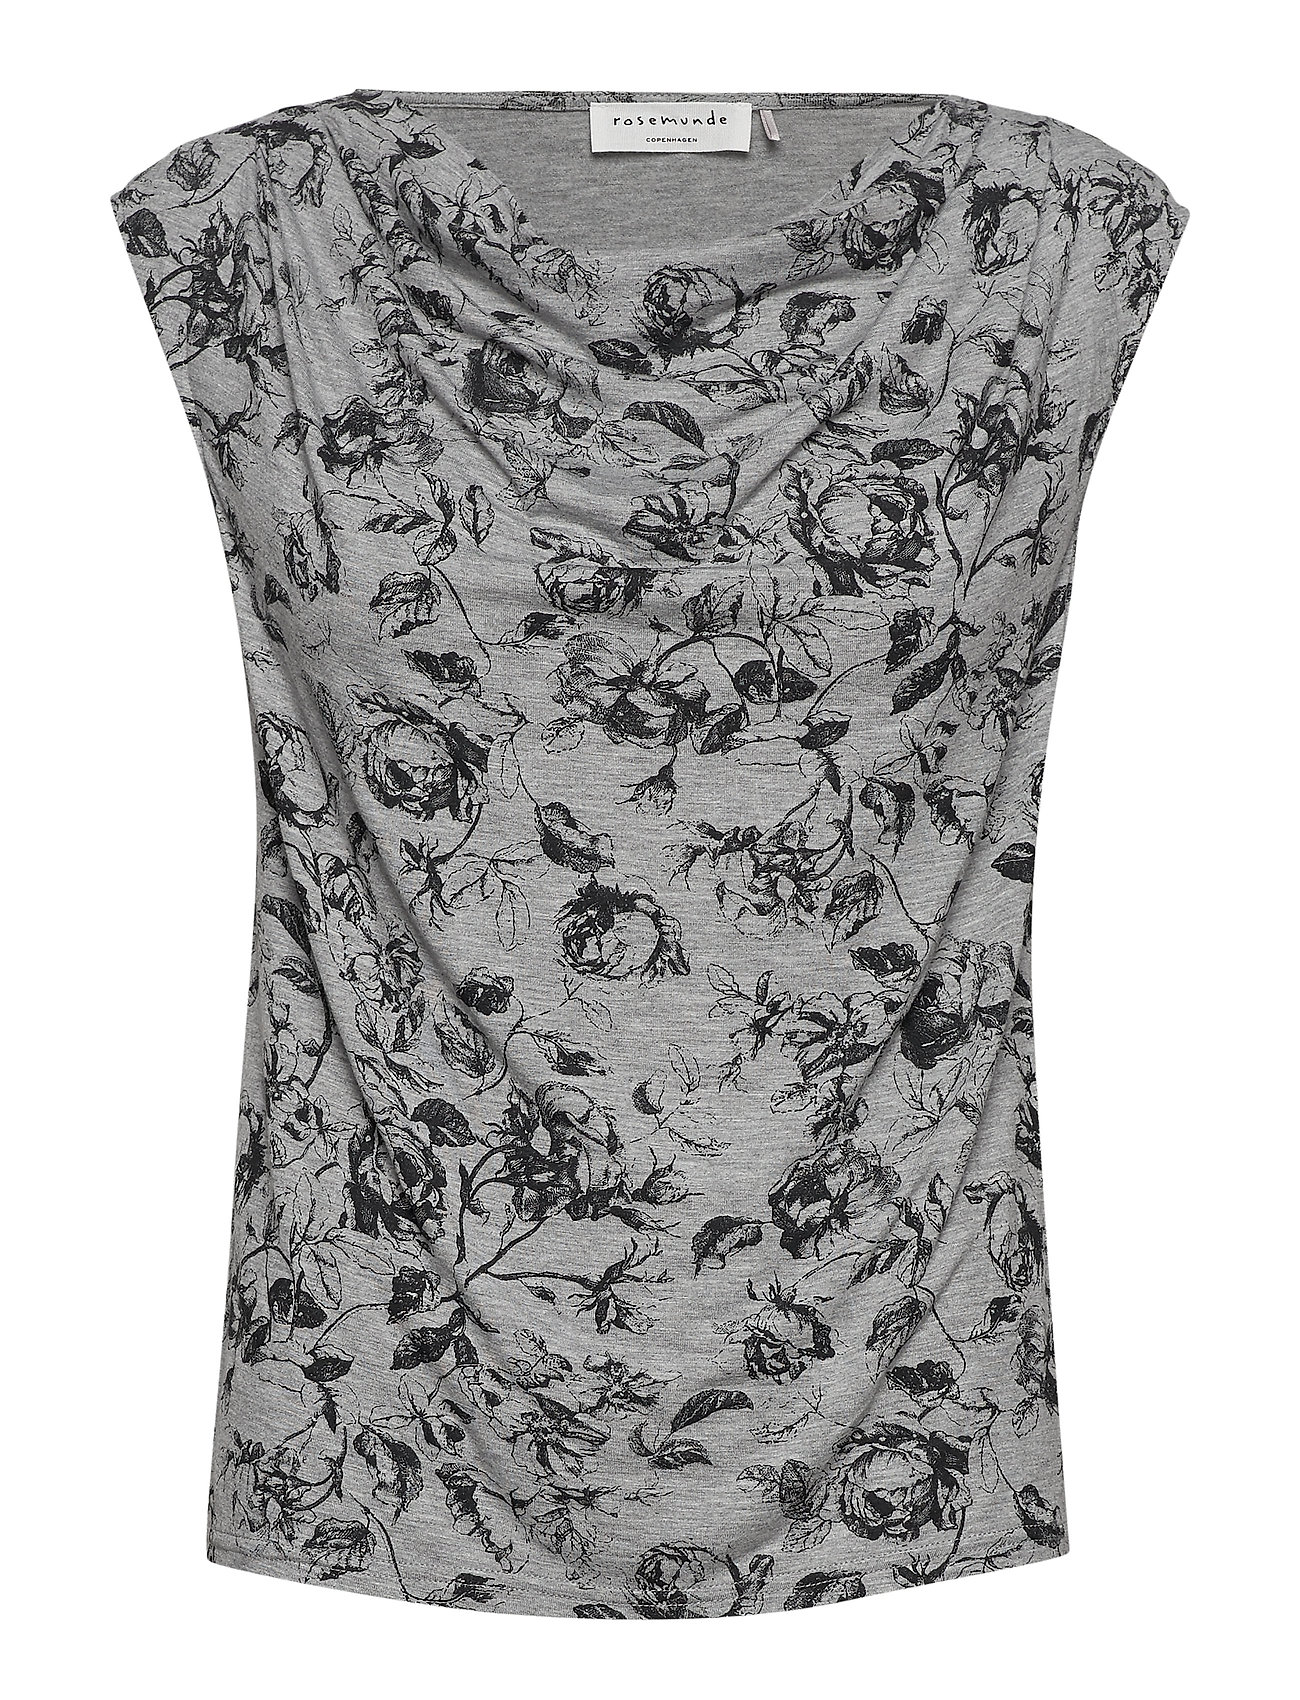 Rosemunde T-shirt ss - GREY VINTAGE ROSE PRINT